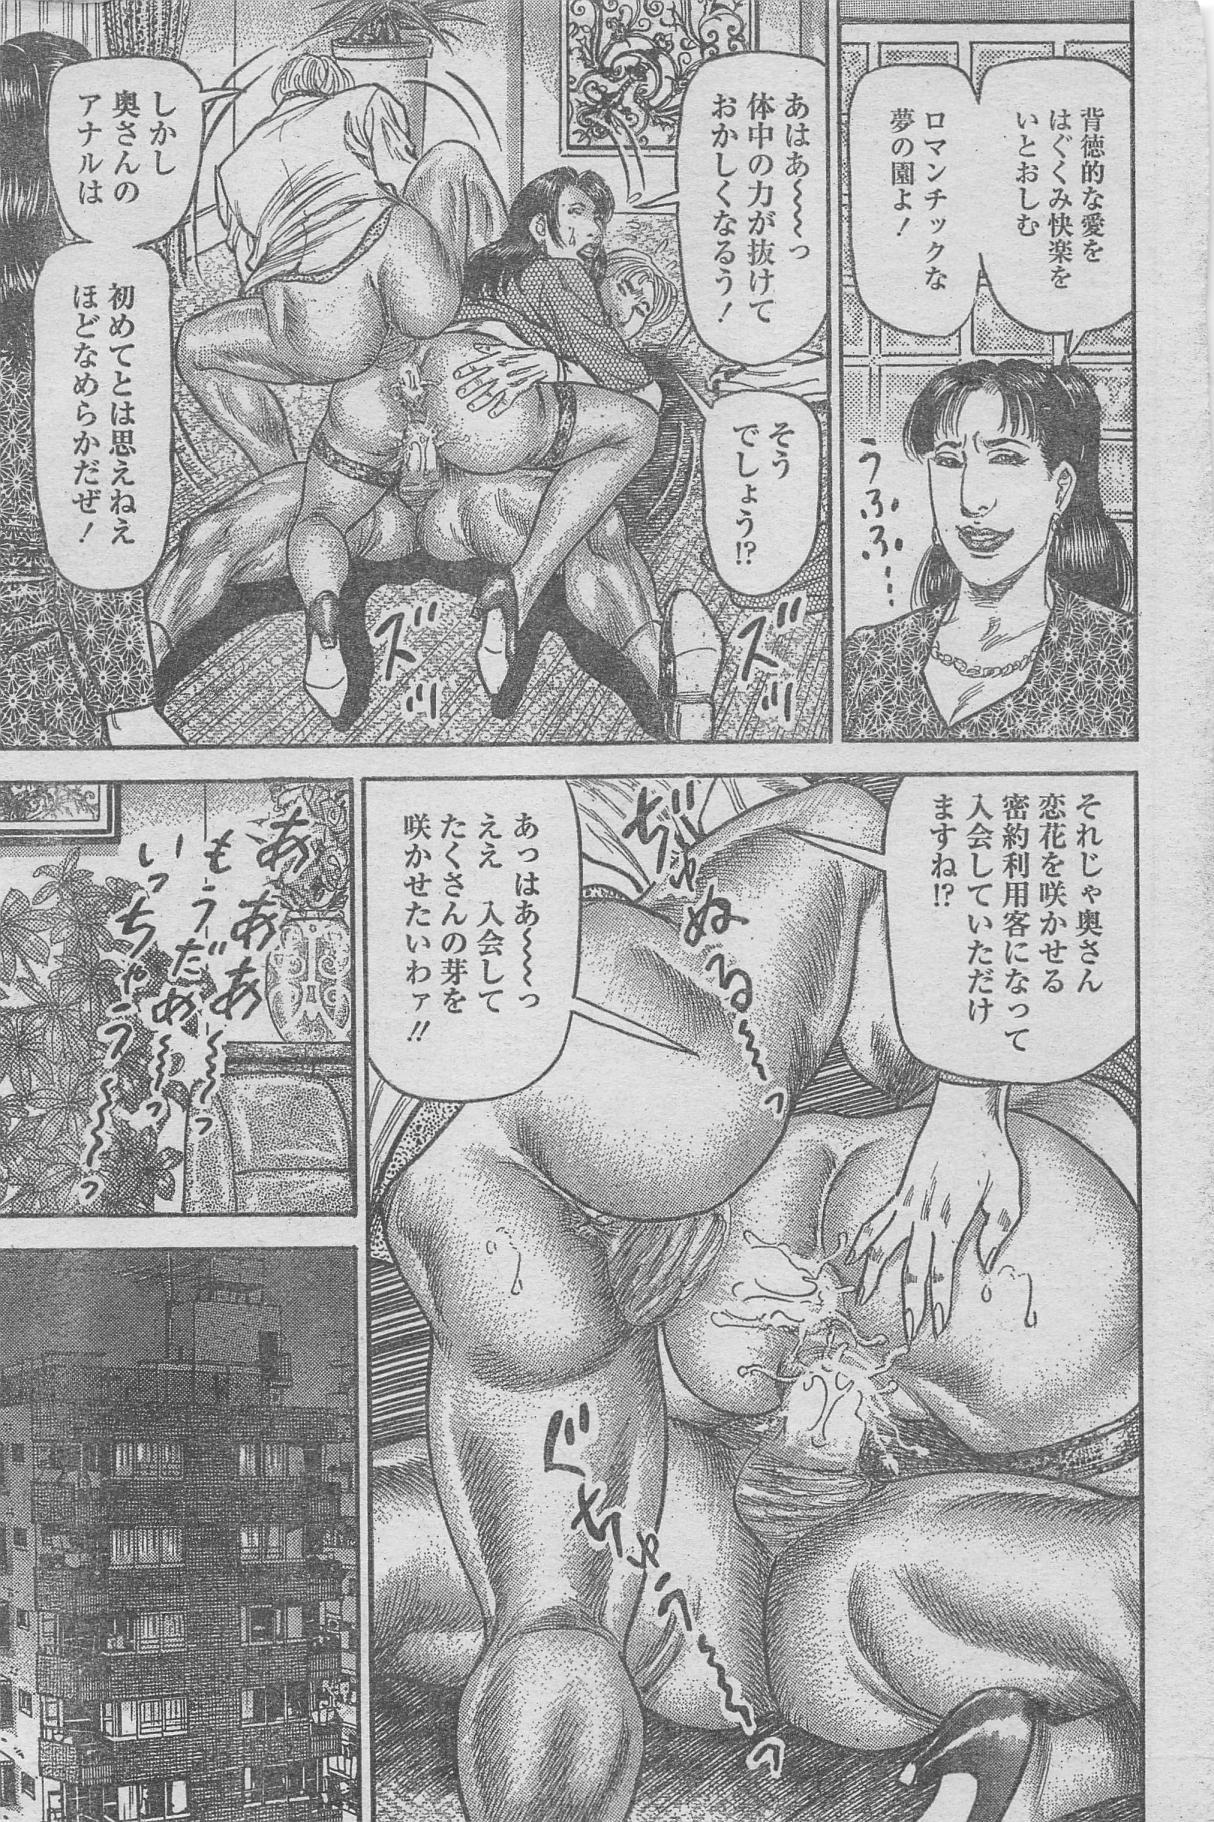 Manga Lawrence 2013-04 62